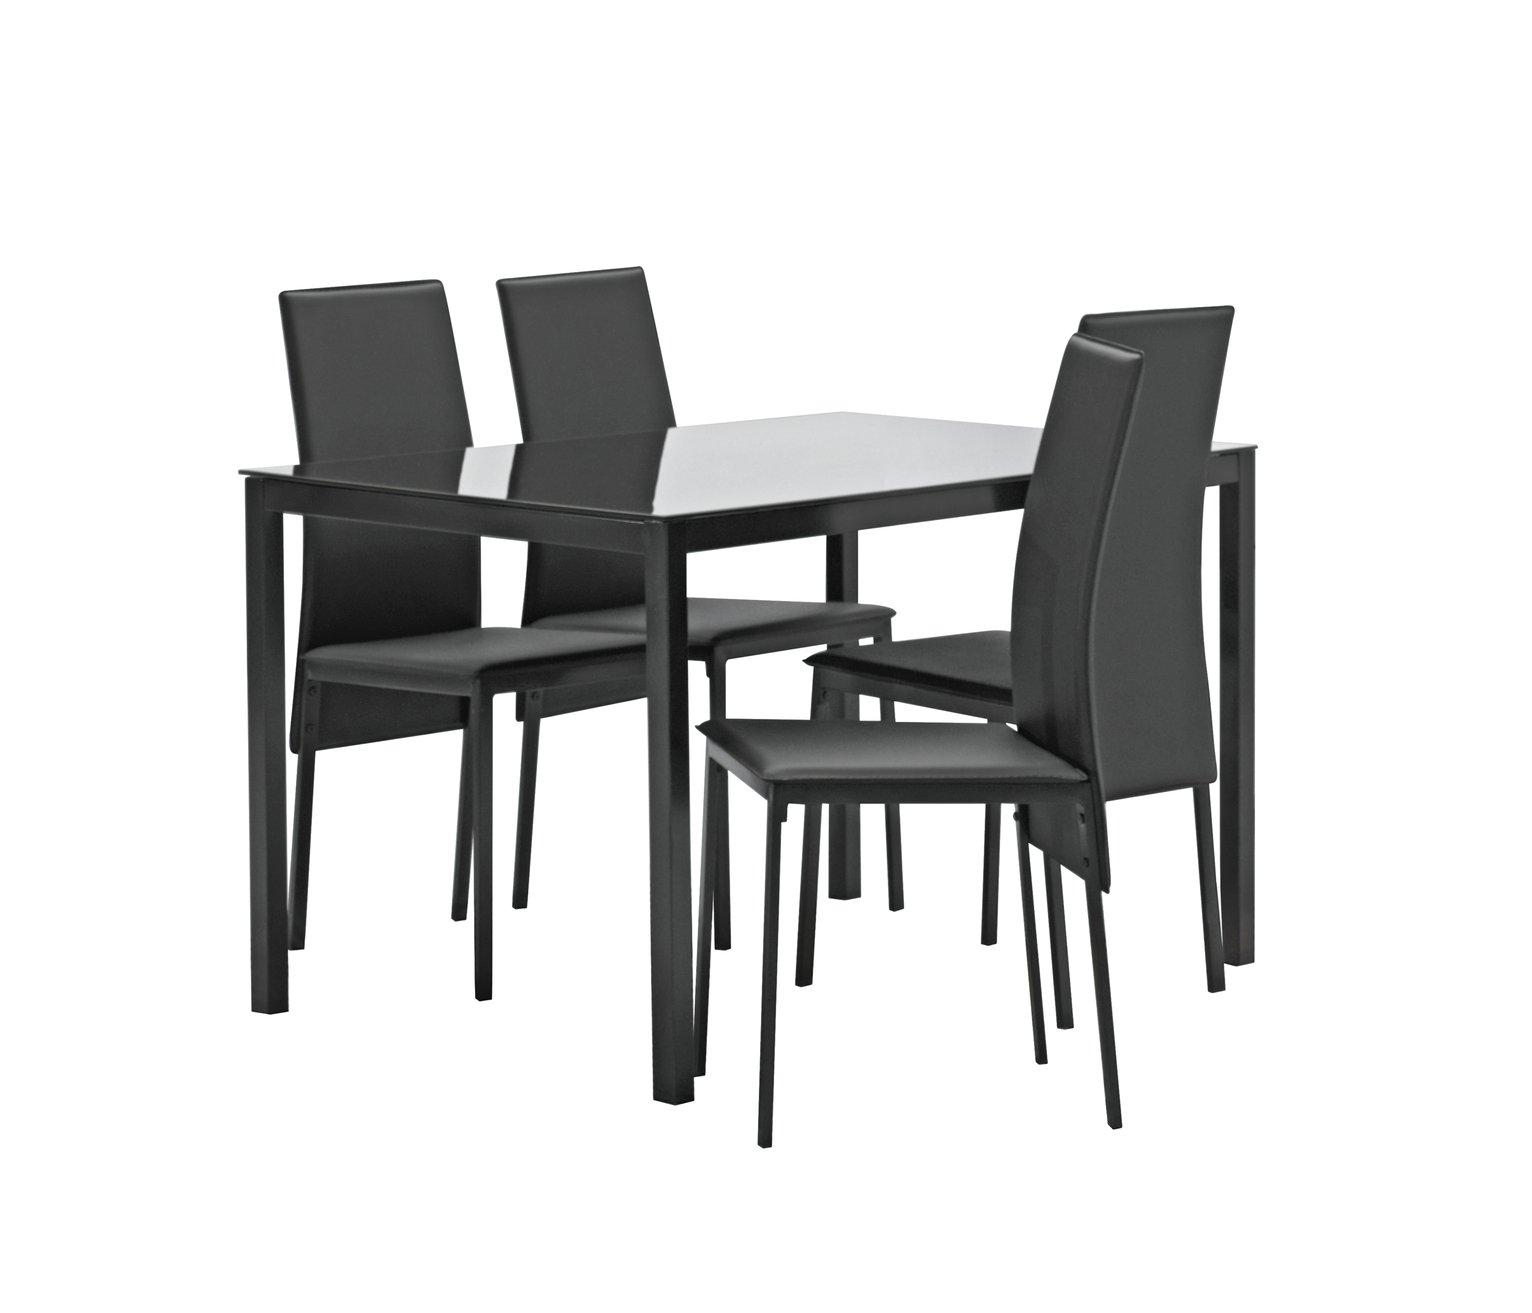 hygena lido glass dining table  u0026 4 chairs   black dining room furniture   argos  rh   argos co uk